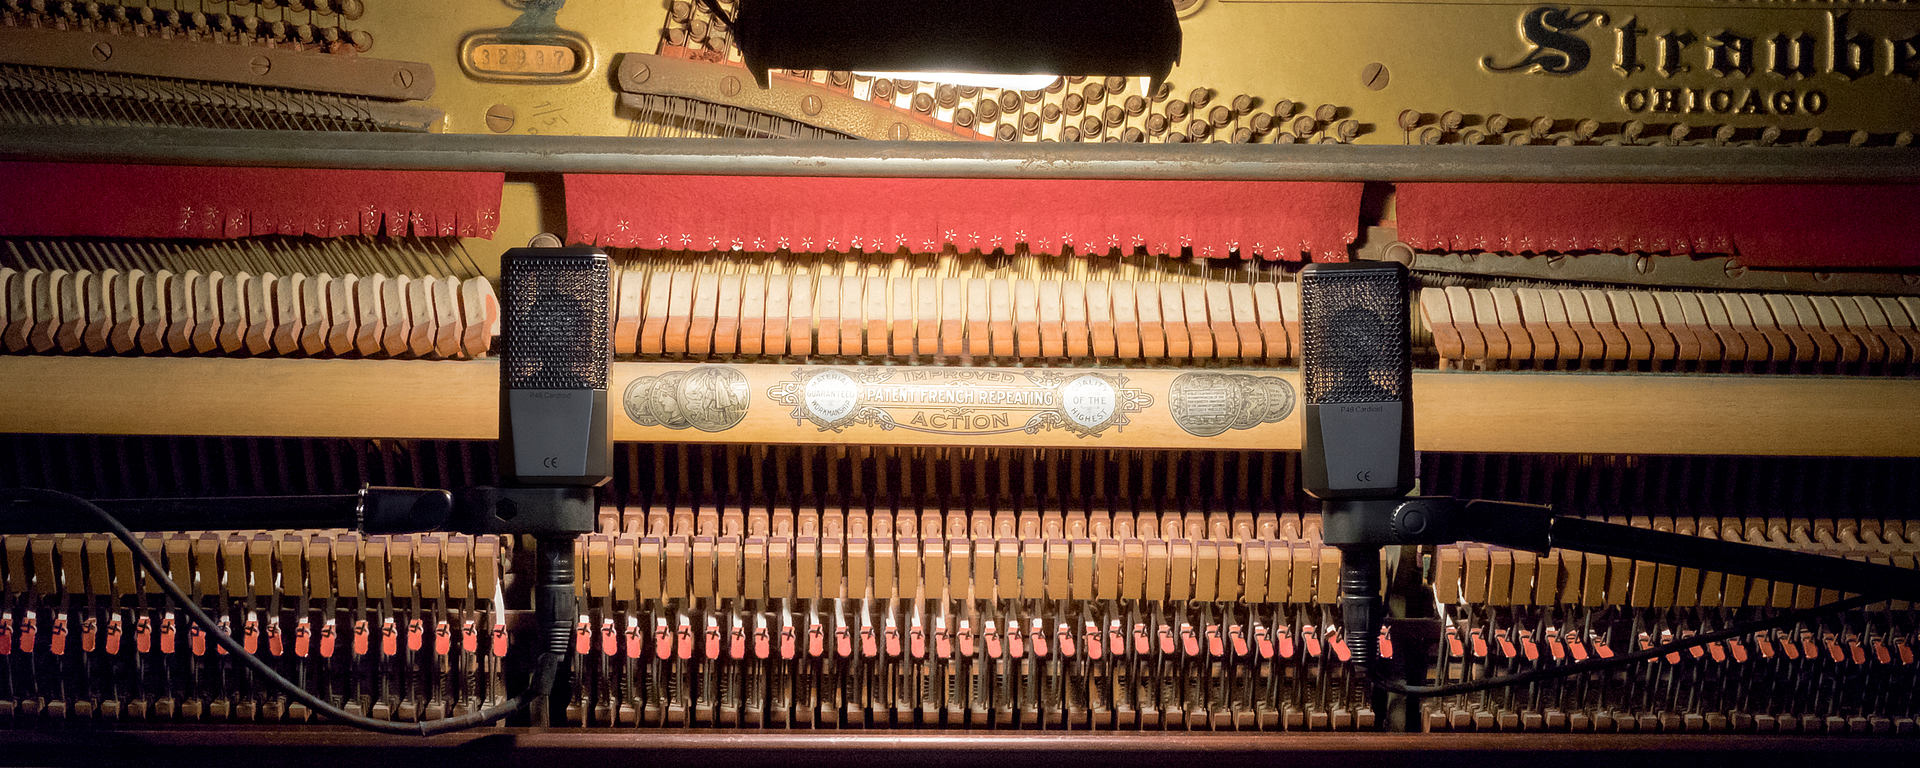 LCT 240 PRO piano